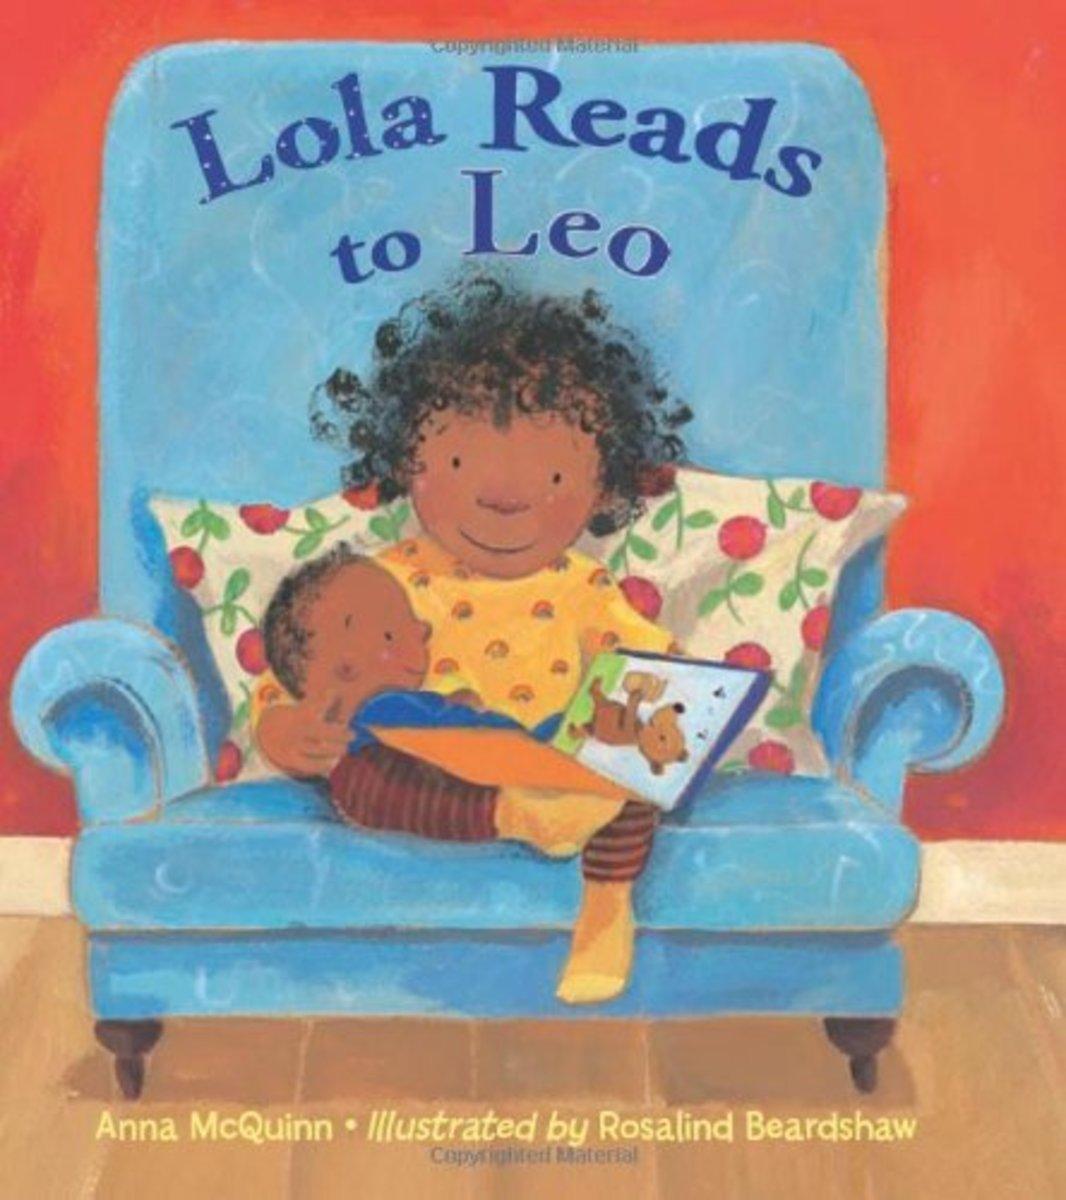 Lola Reads to Leo by Anna McQuinn